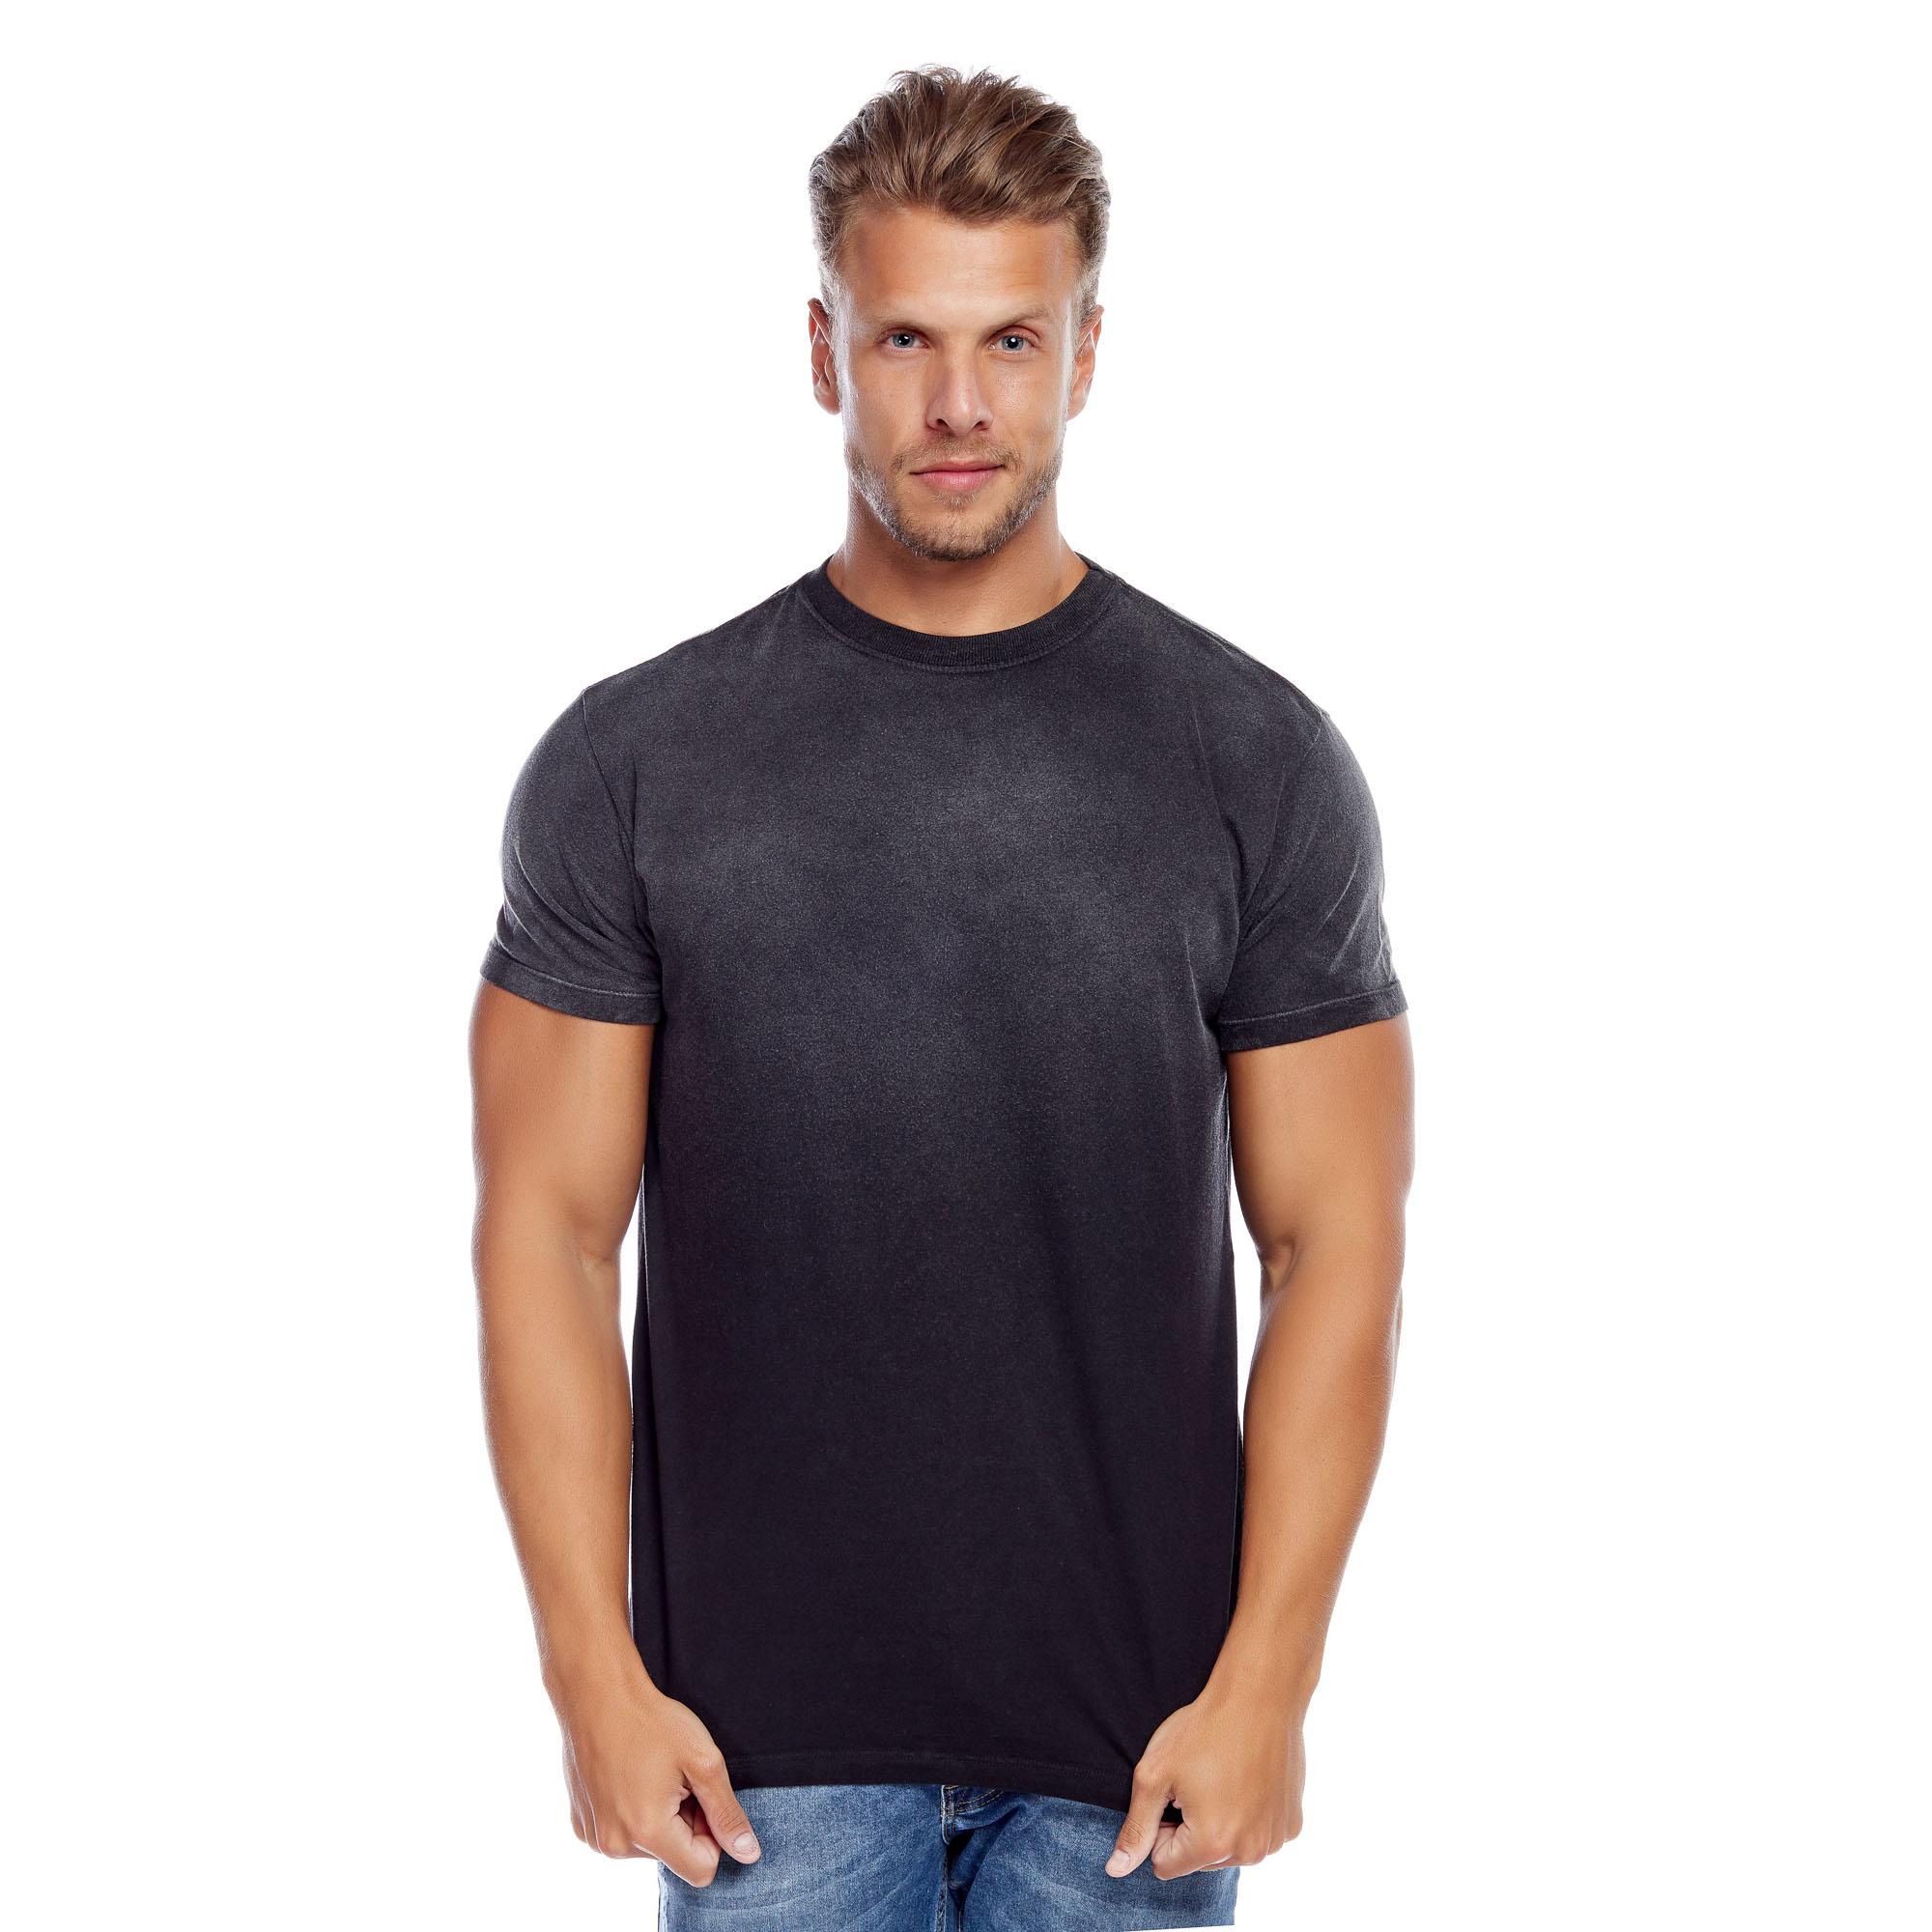 Camiseta Masculina Used Superior Evolvee